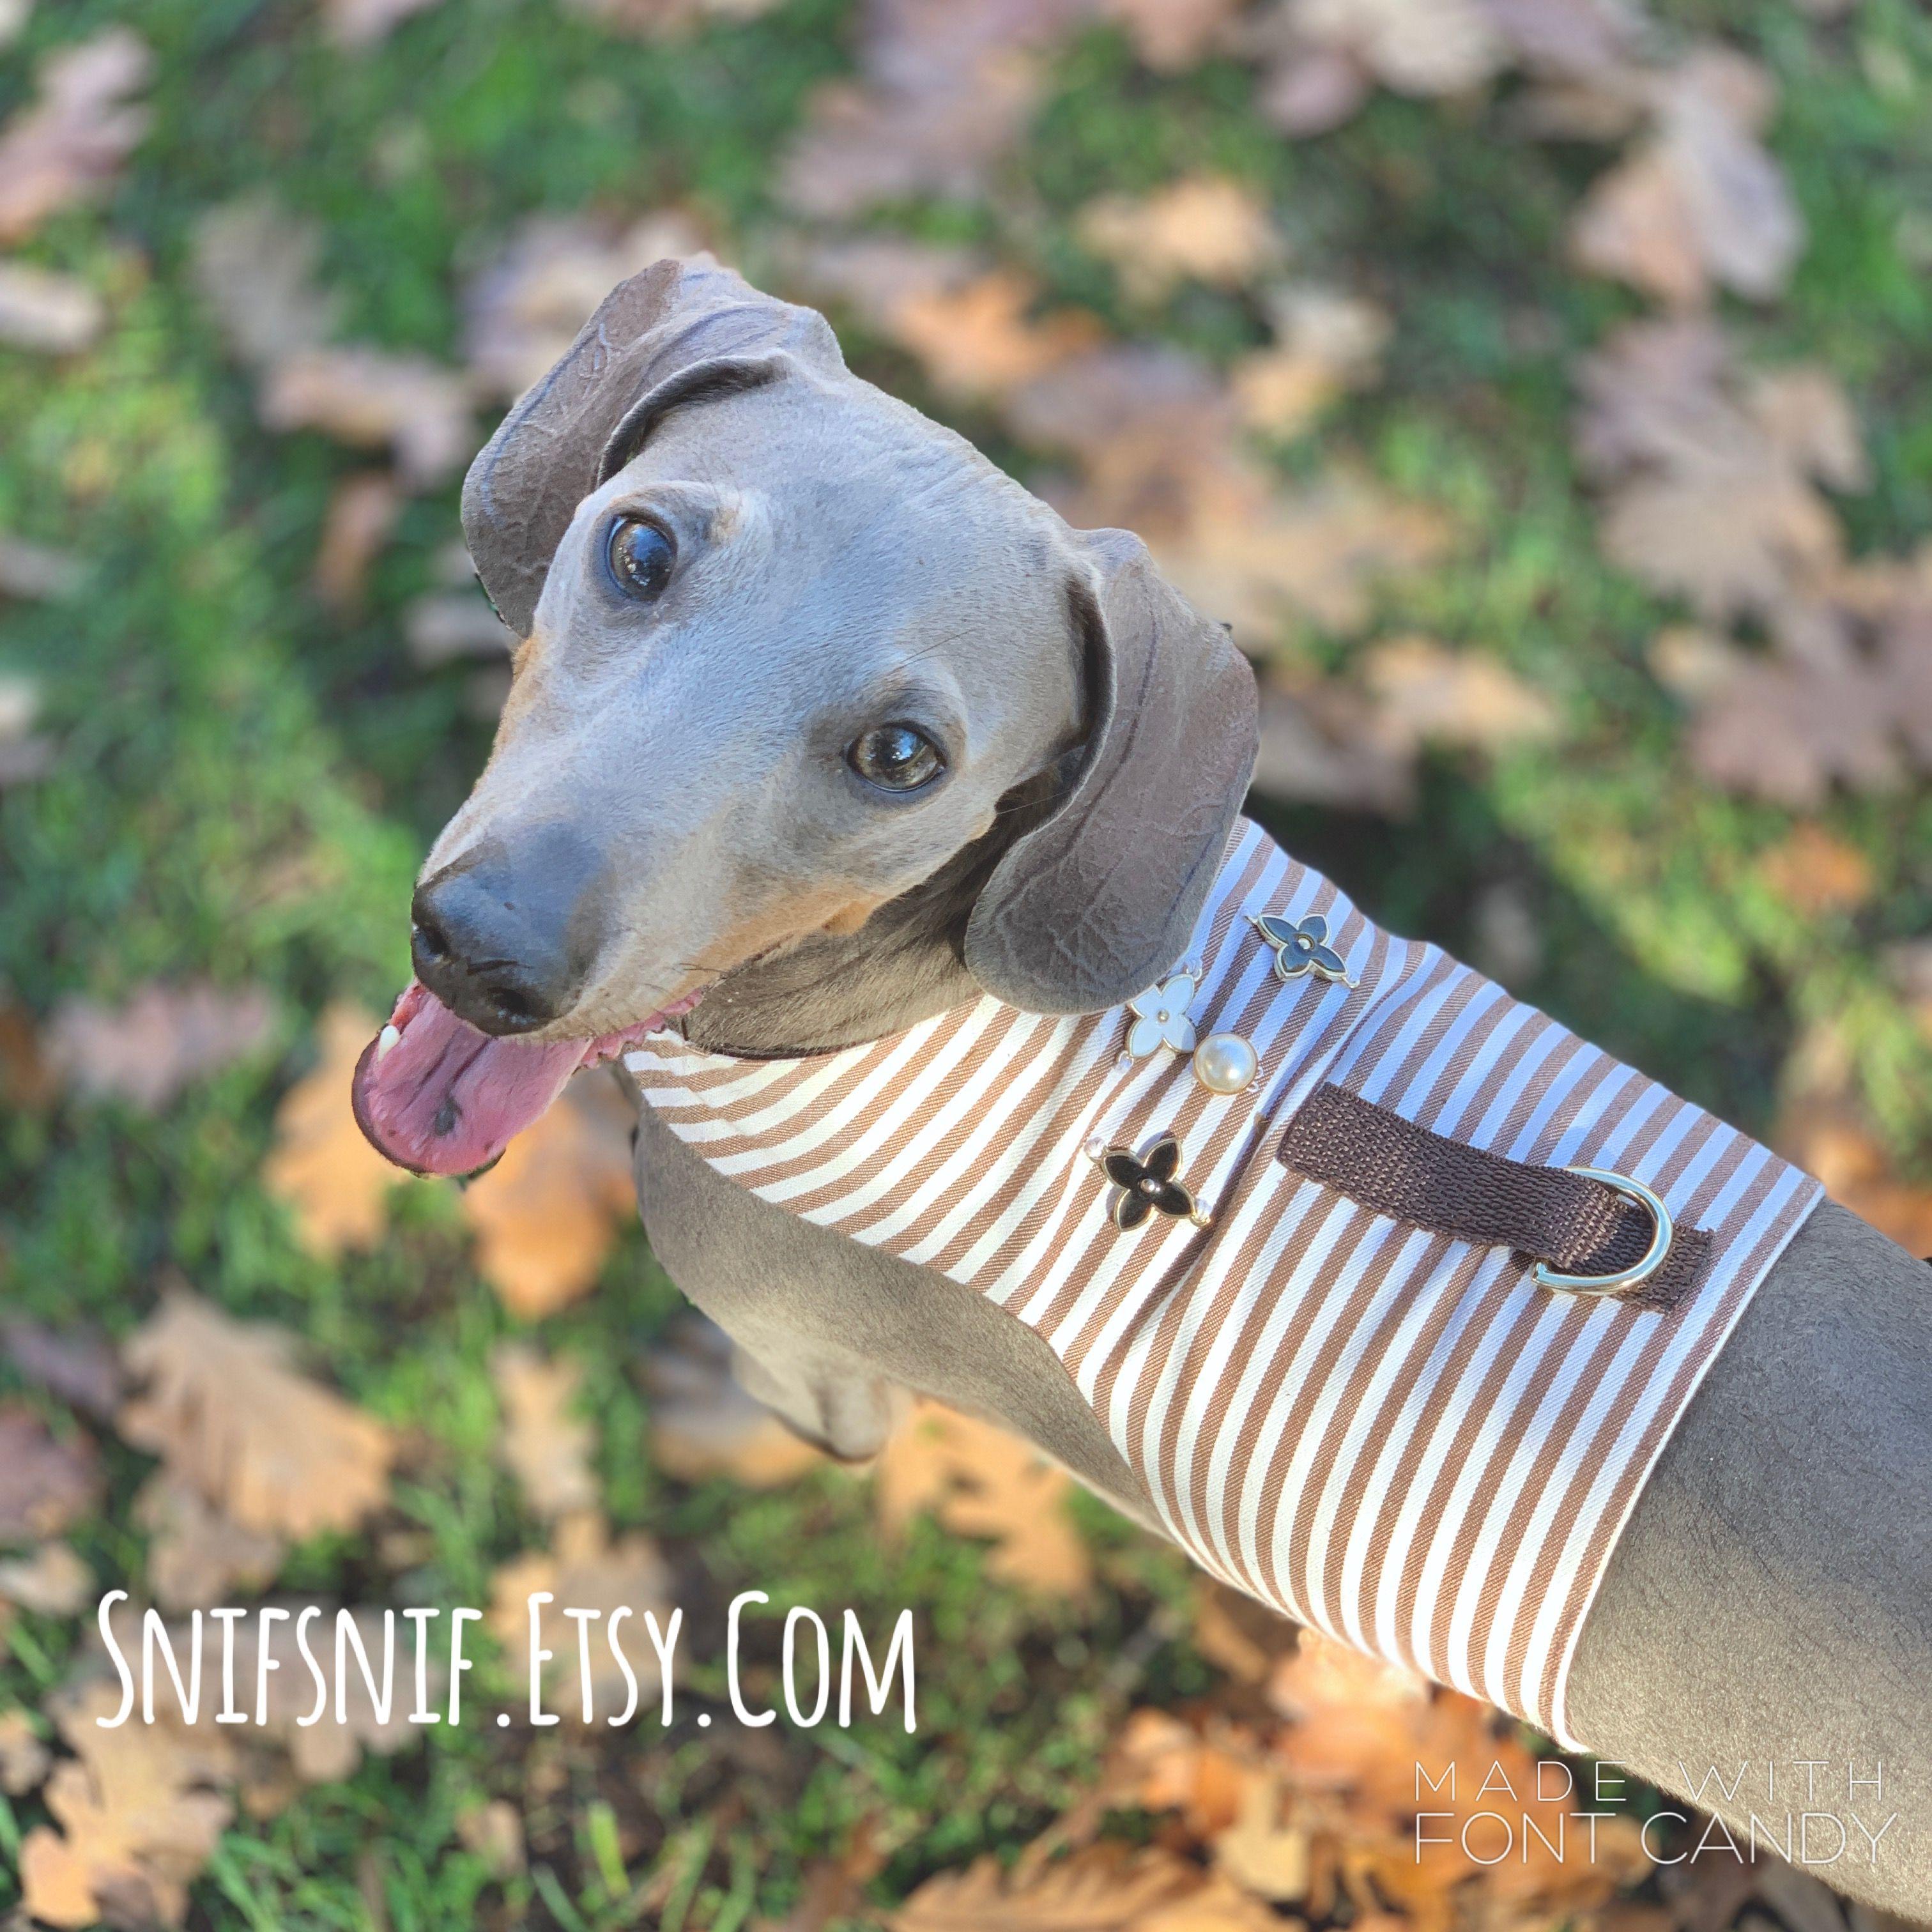 Lv Inspired Designer Dog Jacket Dog Harness No Choke Dog Harness